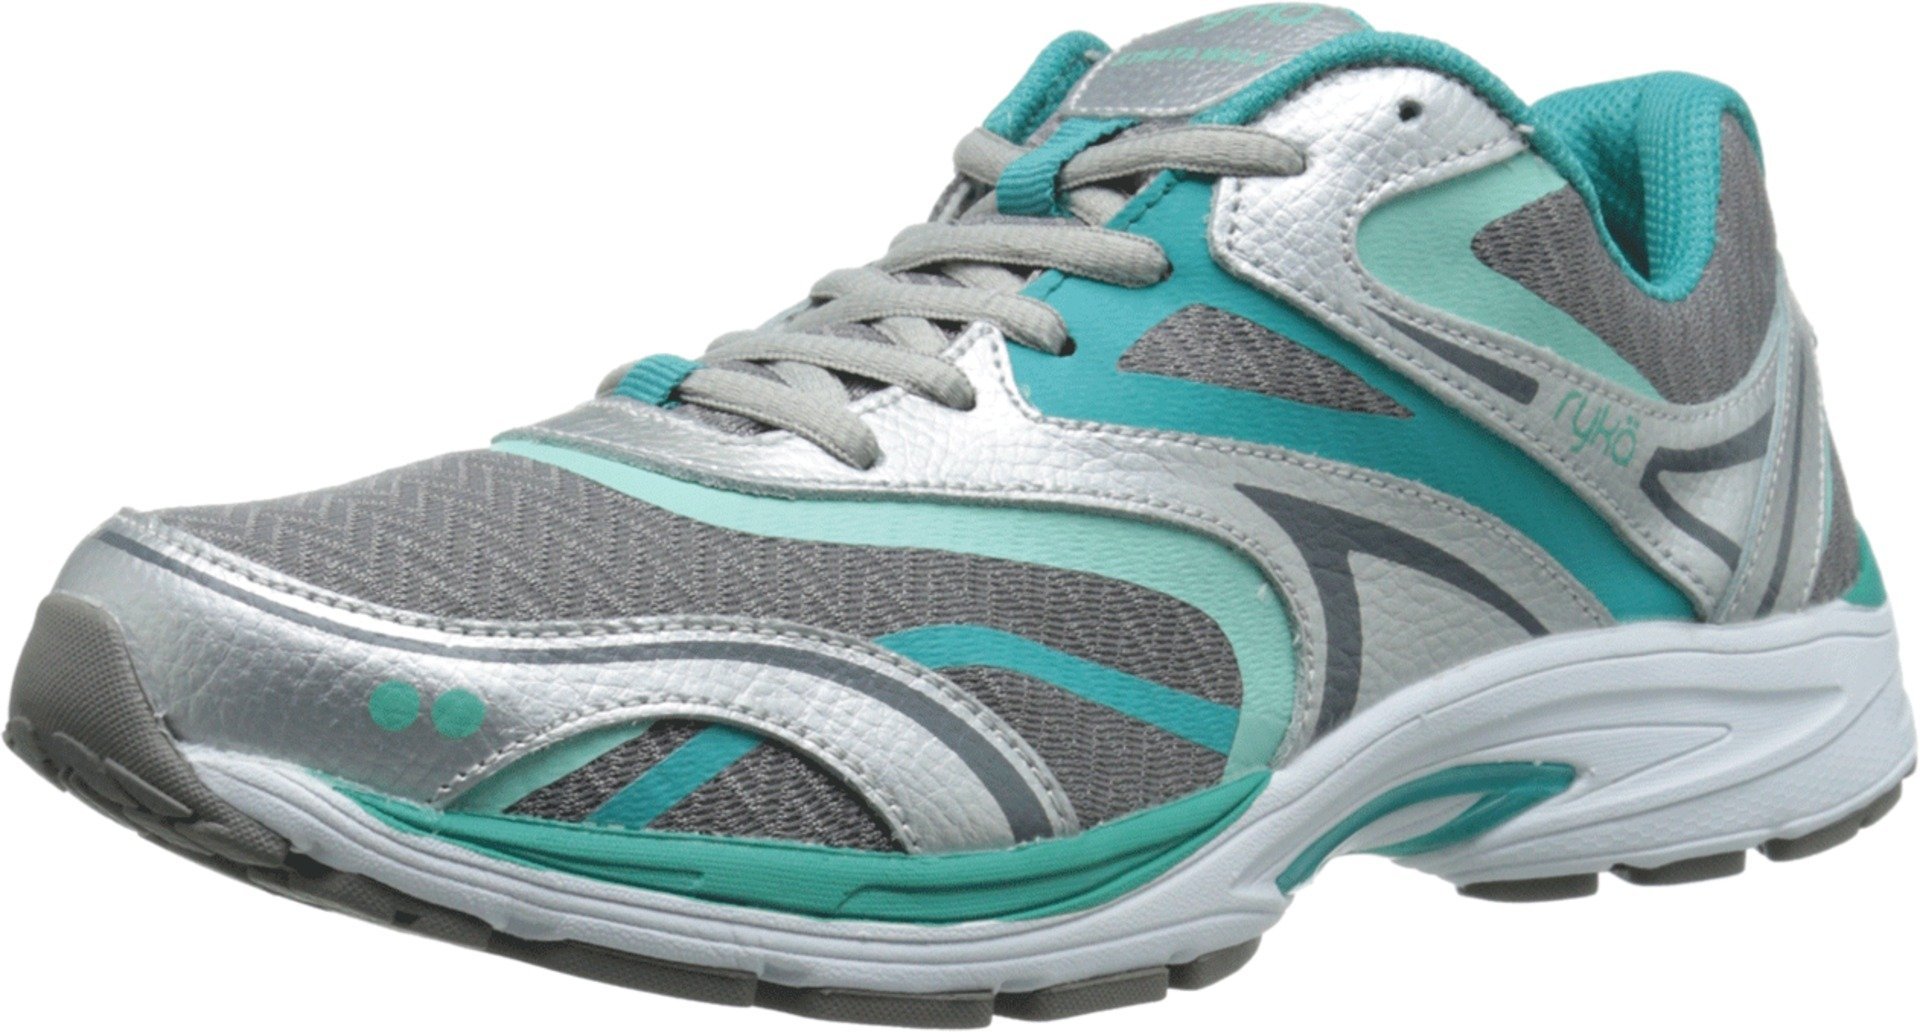 Ryka Women's Strata Walk Walking Shoe, Frost Grey/Beach Glass/Teal Blast/Chrome Silver, 7.5 M US